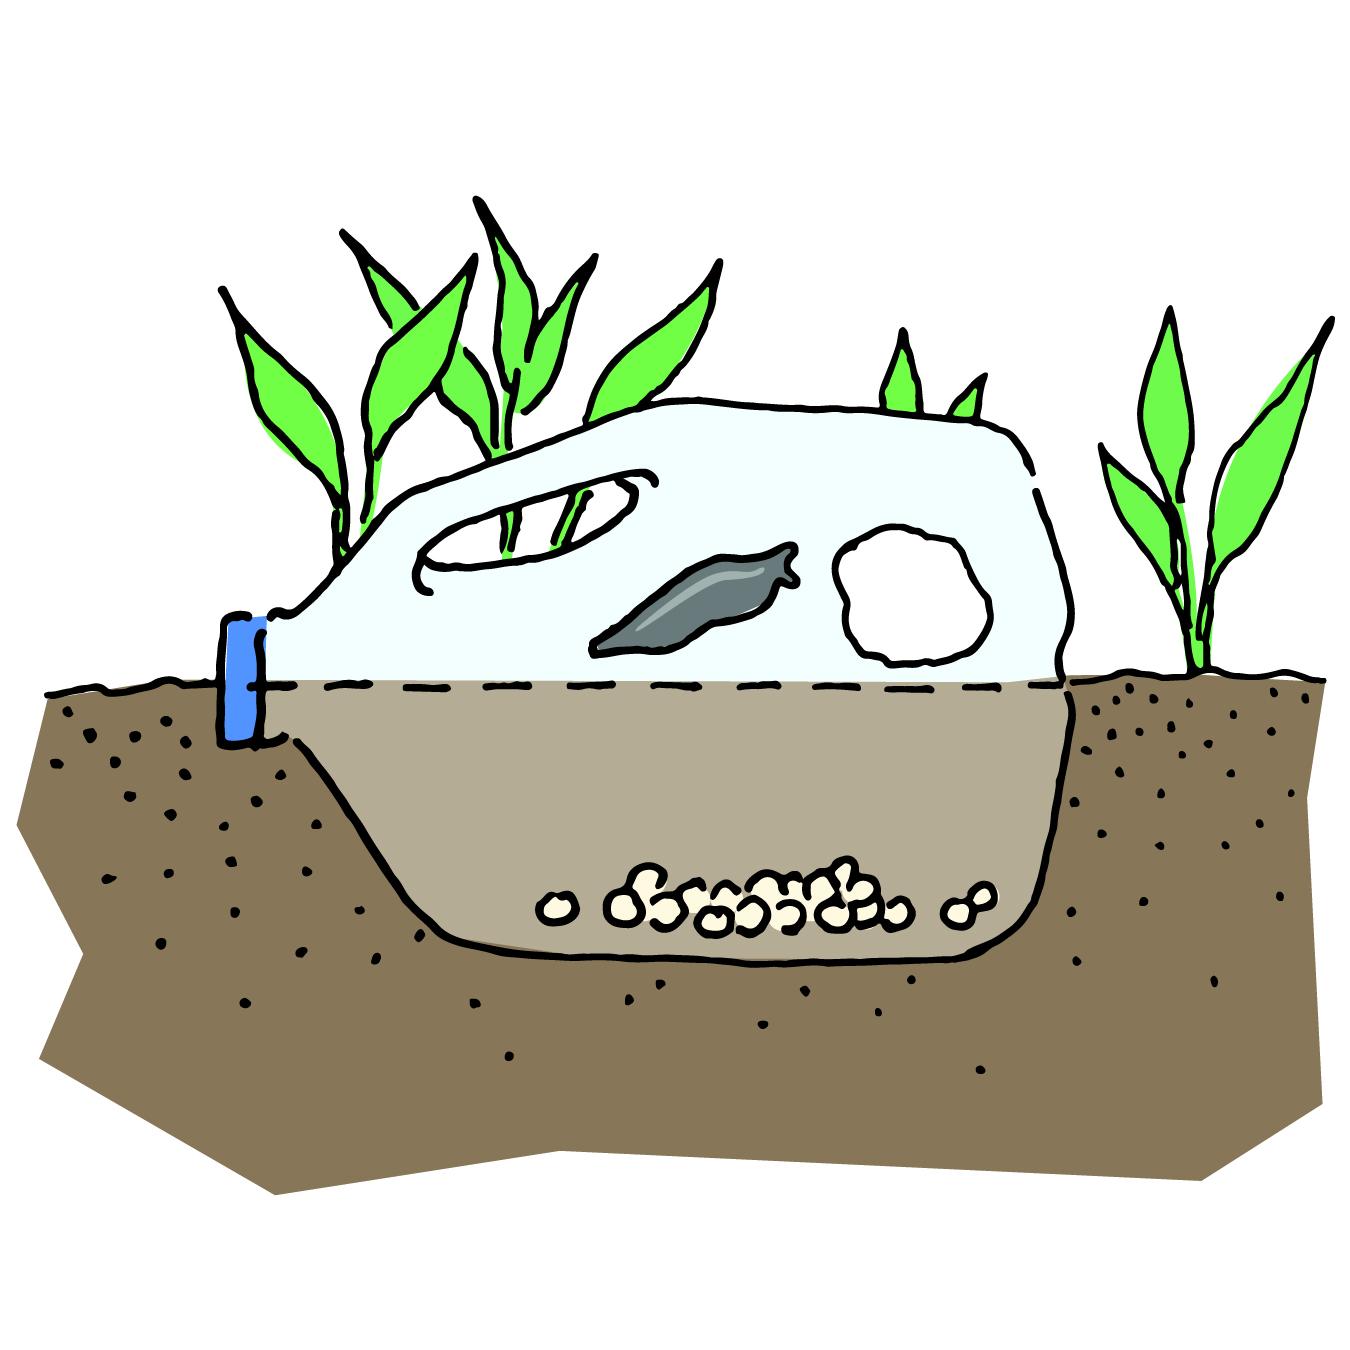 Milk jug with slug bait partially buried in the ground